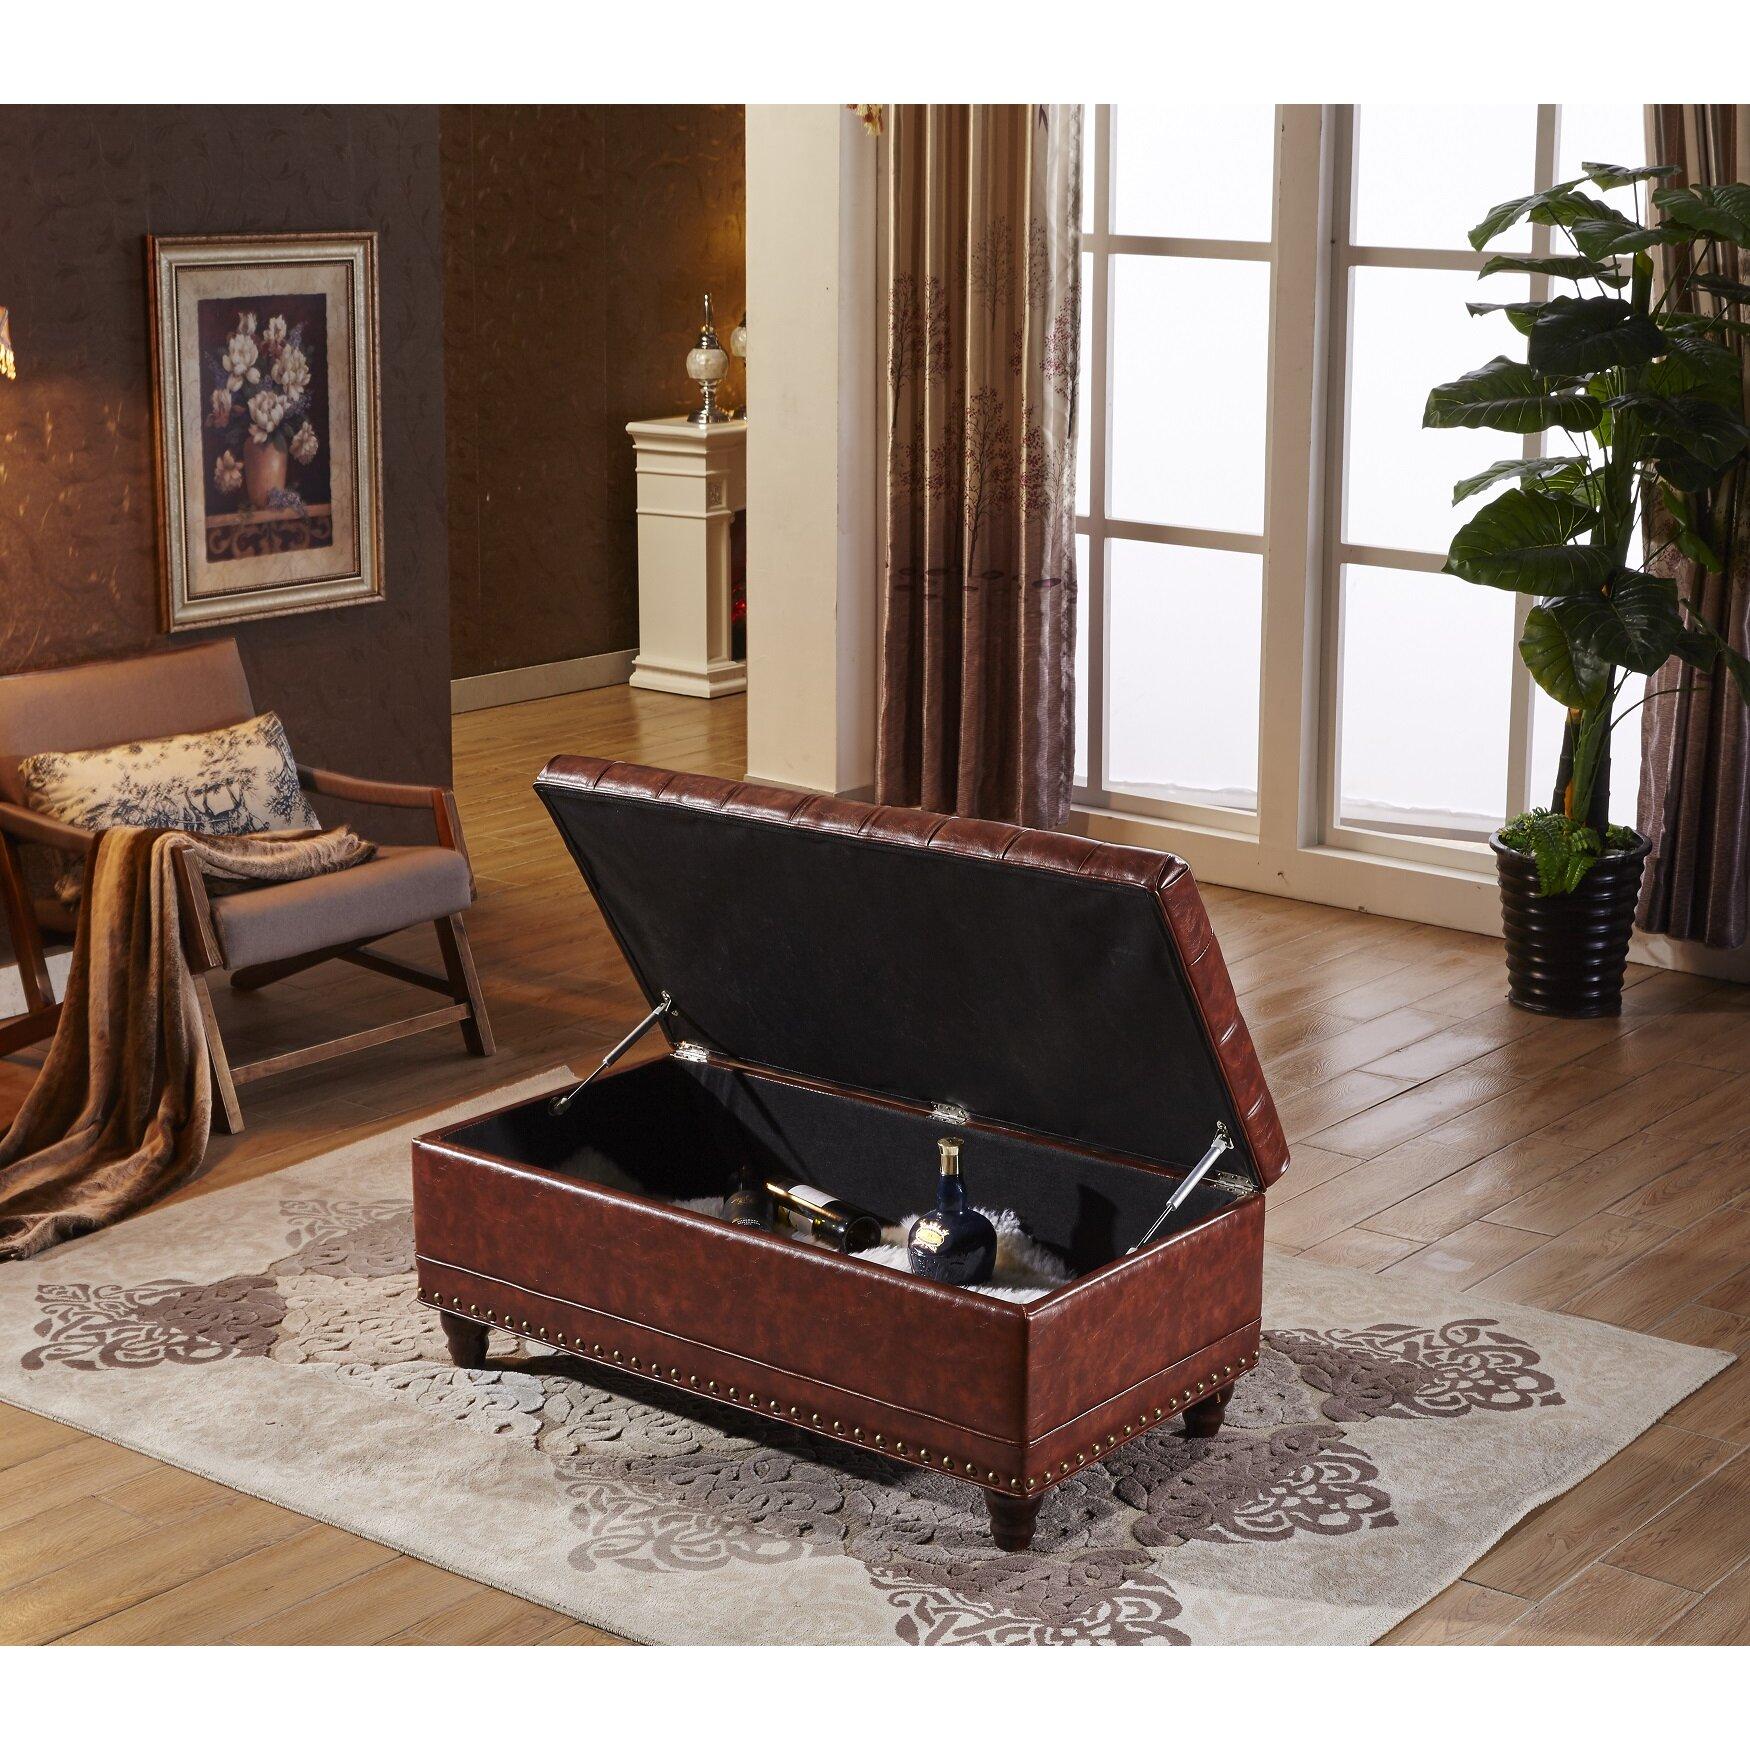 Noya Usa Castilian Upholstered Storage Bedroom Bench: NOYA USA Elegant Wood Storage Bedroom Bench & Reviews